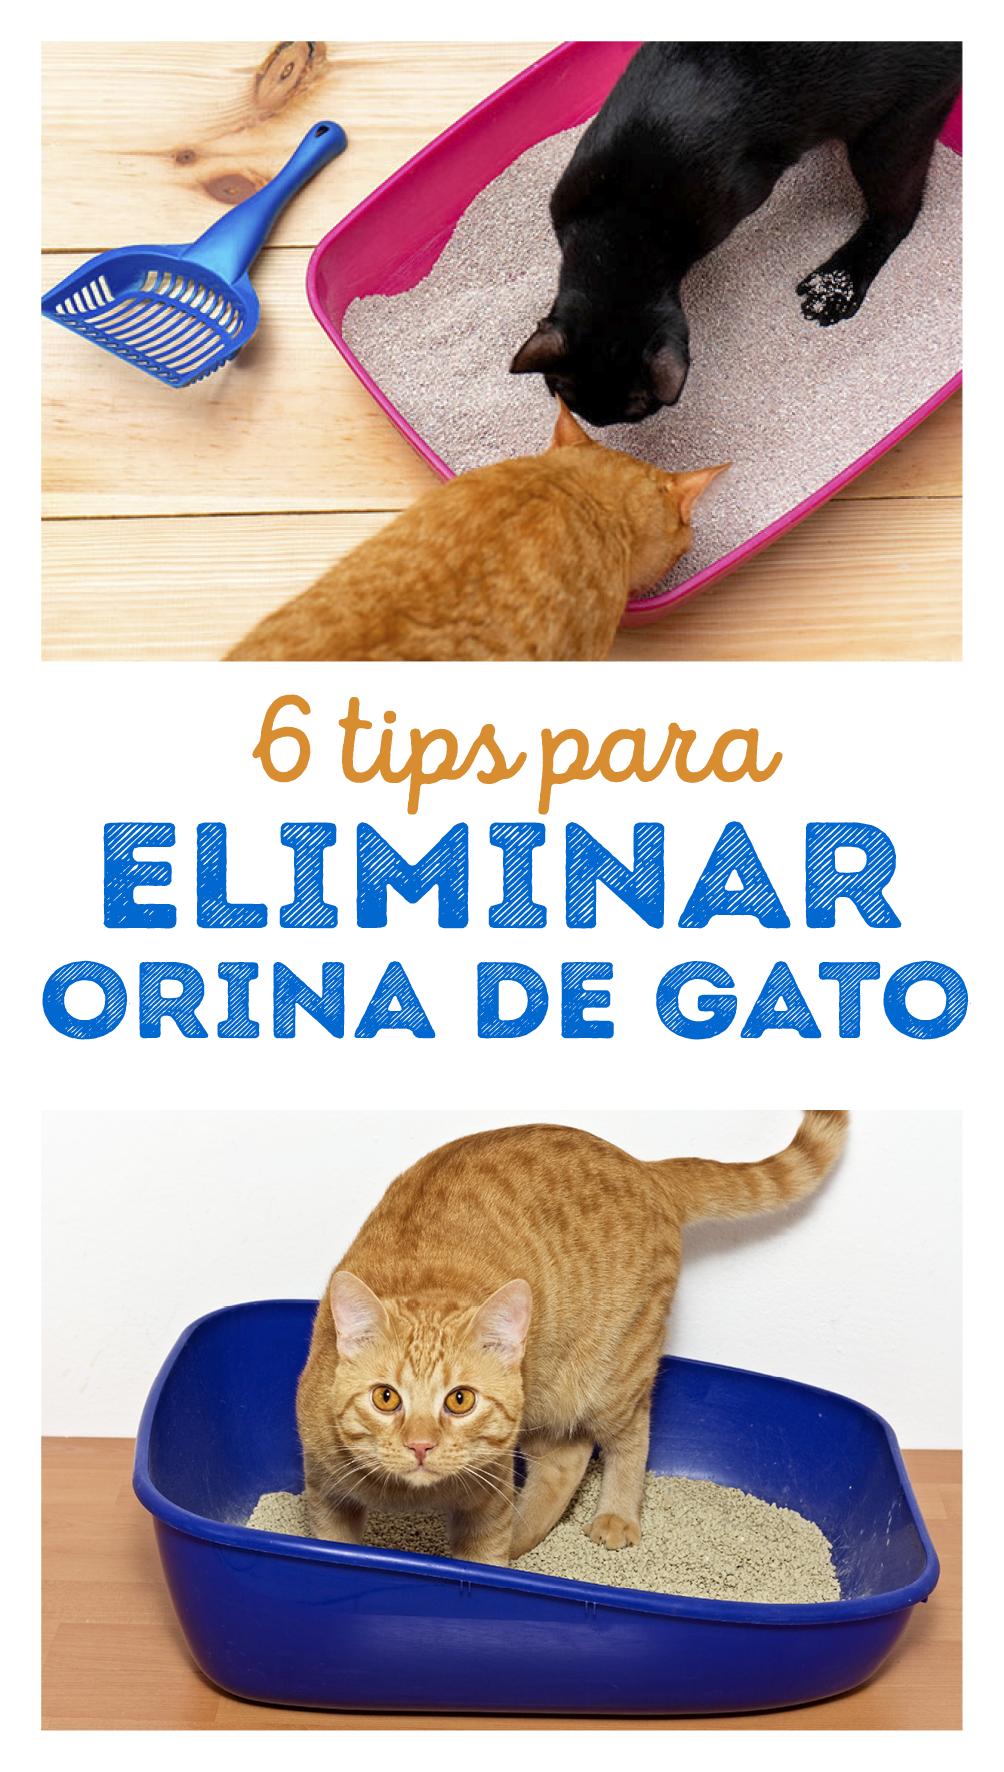 6 Tips Básicos Para Eliminar El Olor A Orina De Gato Cocina Vital Qué Cocinar Hoy Orina De Gato Areneros Para Gatos Eliminar Olor A Orina De Gato